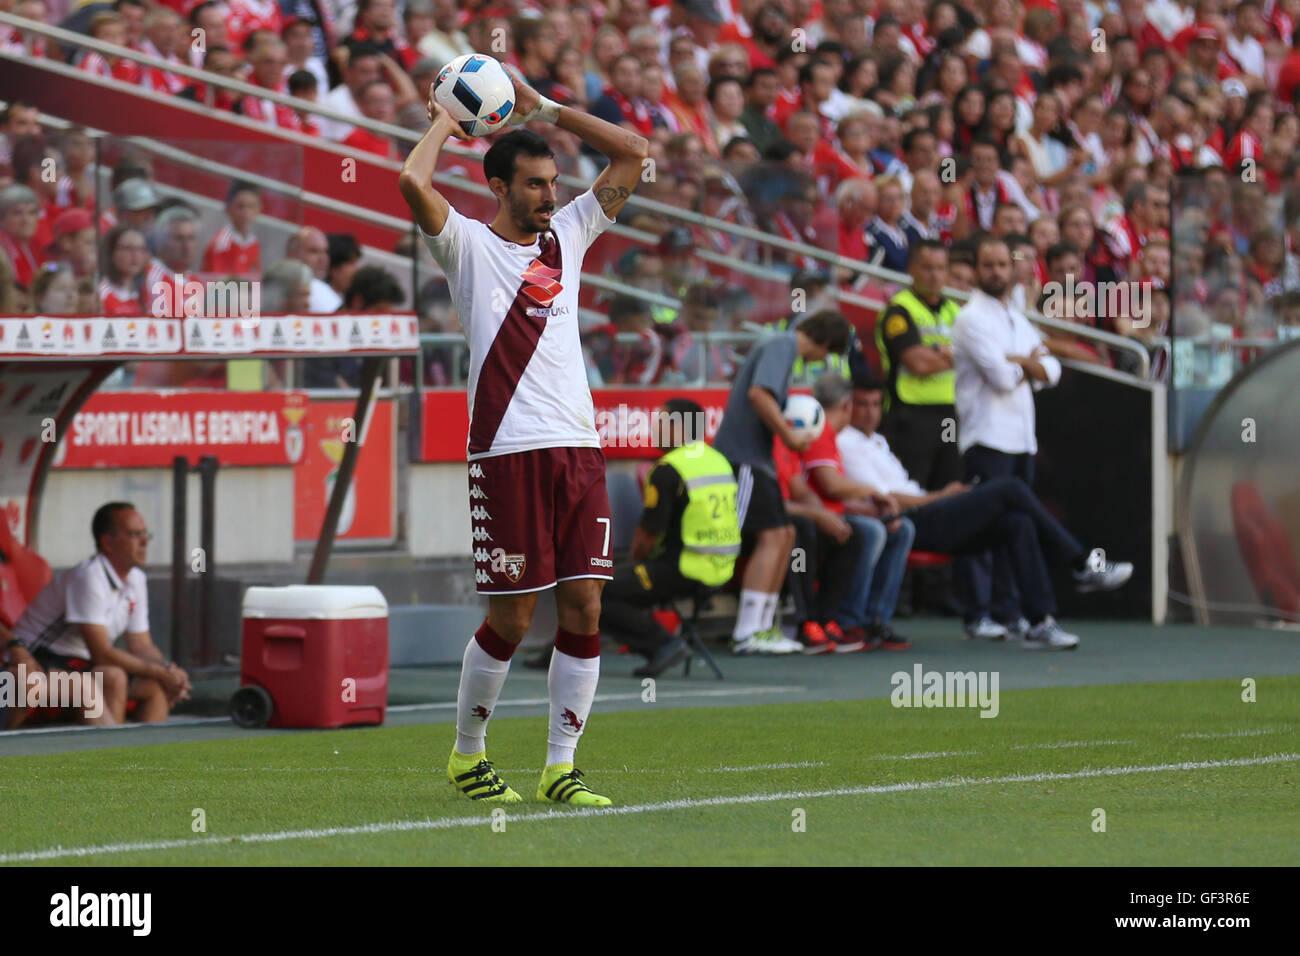 Lisbon, Portugal. 27th July, 2016. Torino's defender Davide Zappacosta Credit:  Alexandre Sousa/Alamy Live News Stock Photo